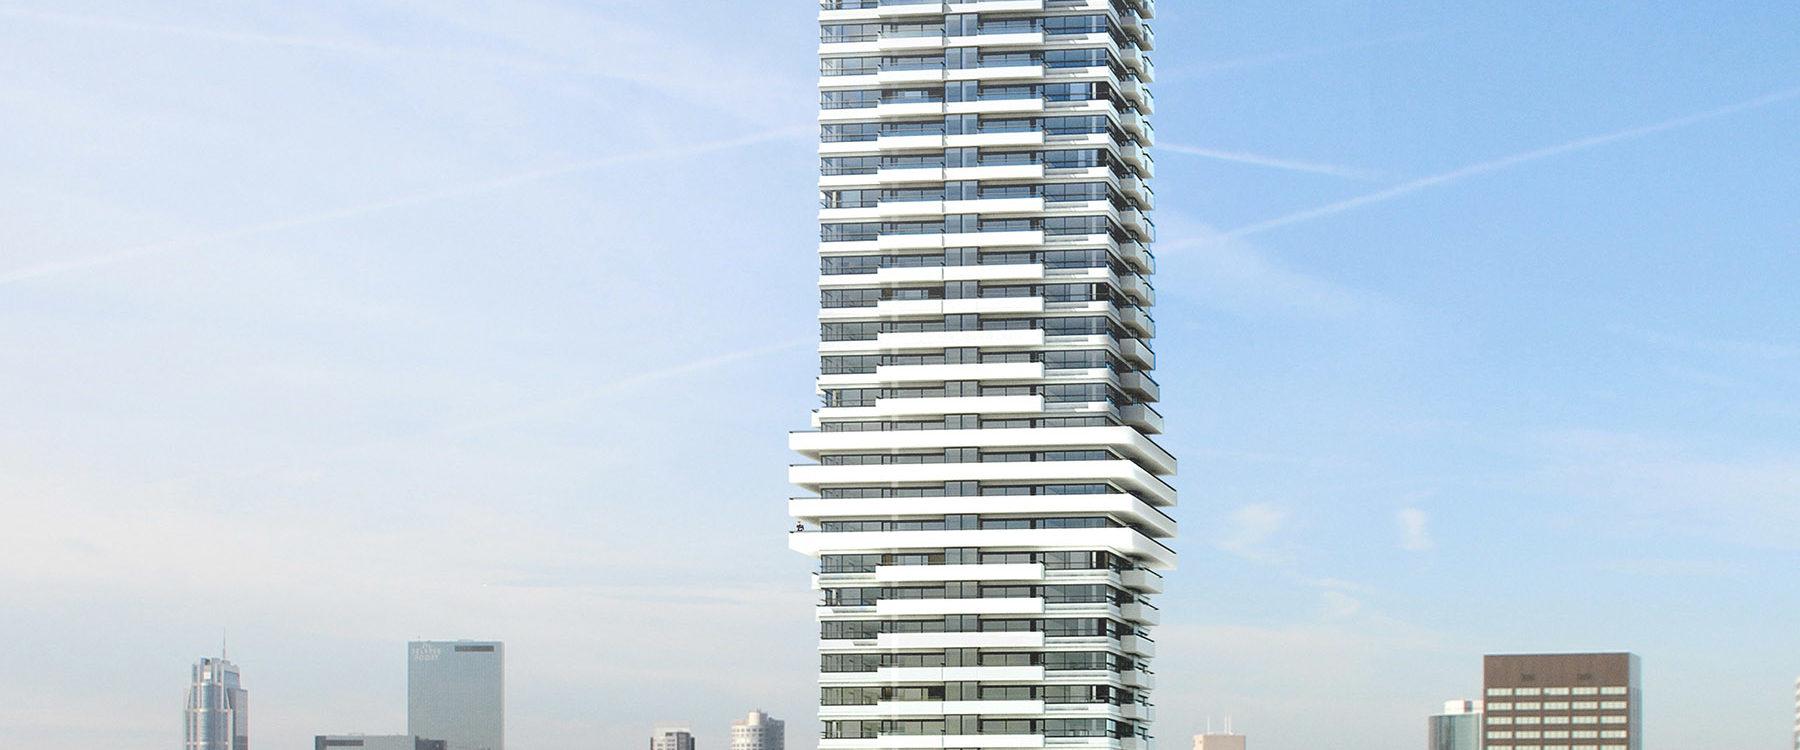 Cooltoren, Rotterdam